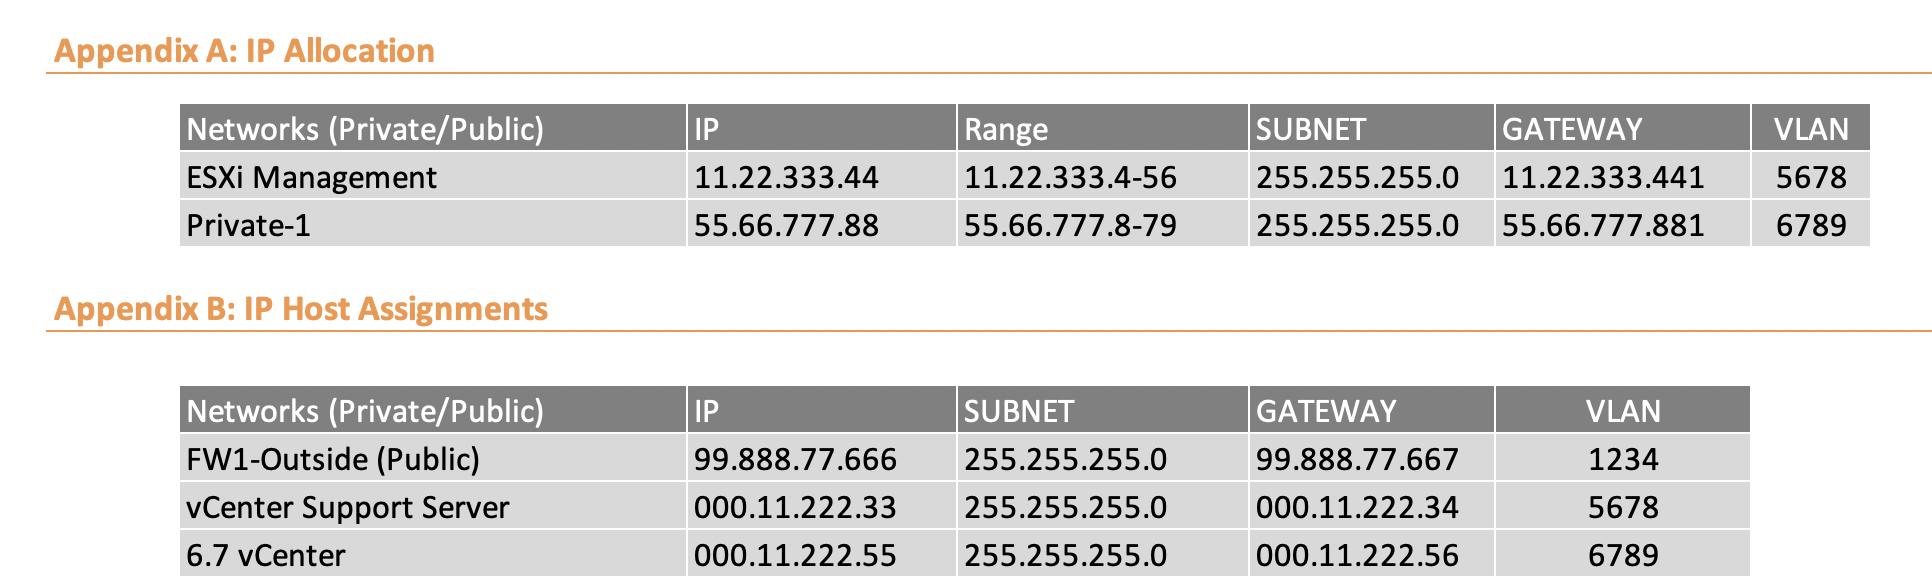 IP allocation